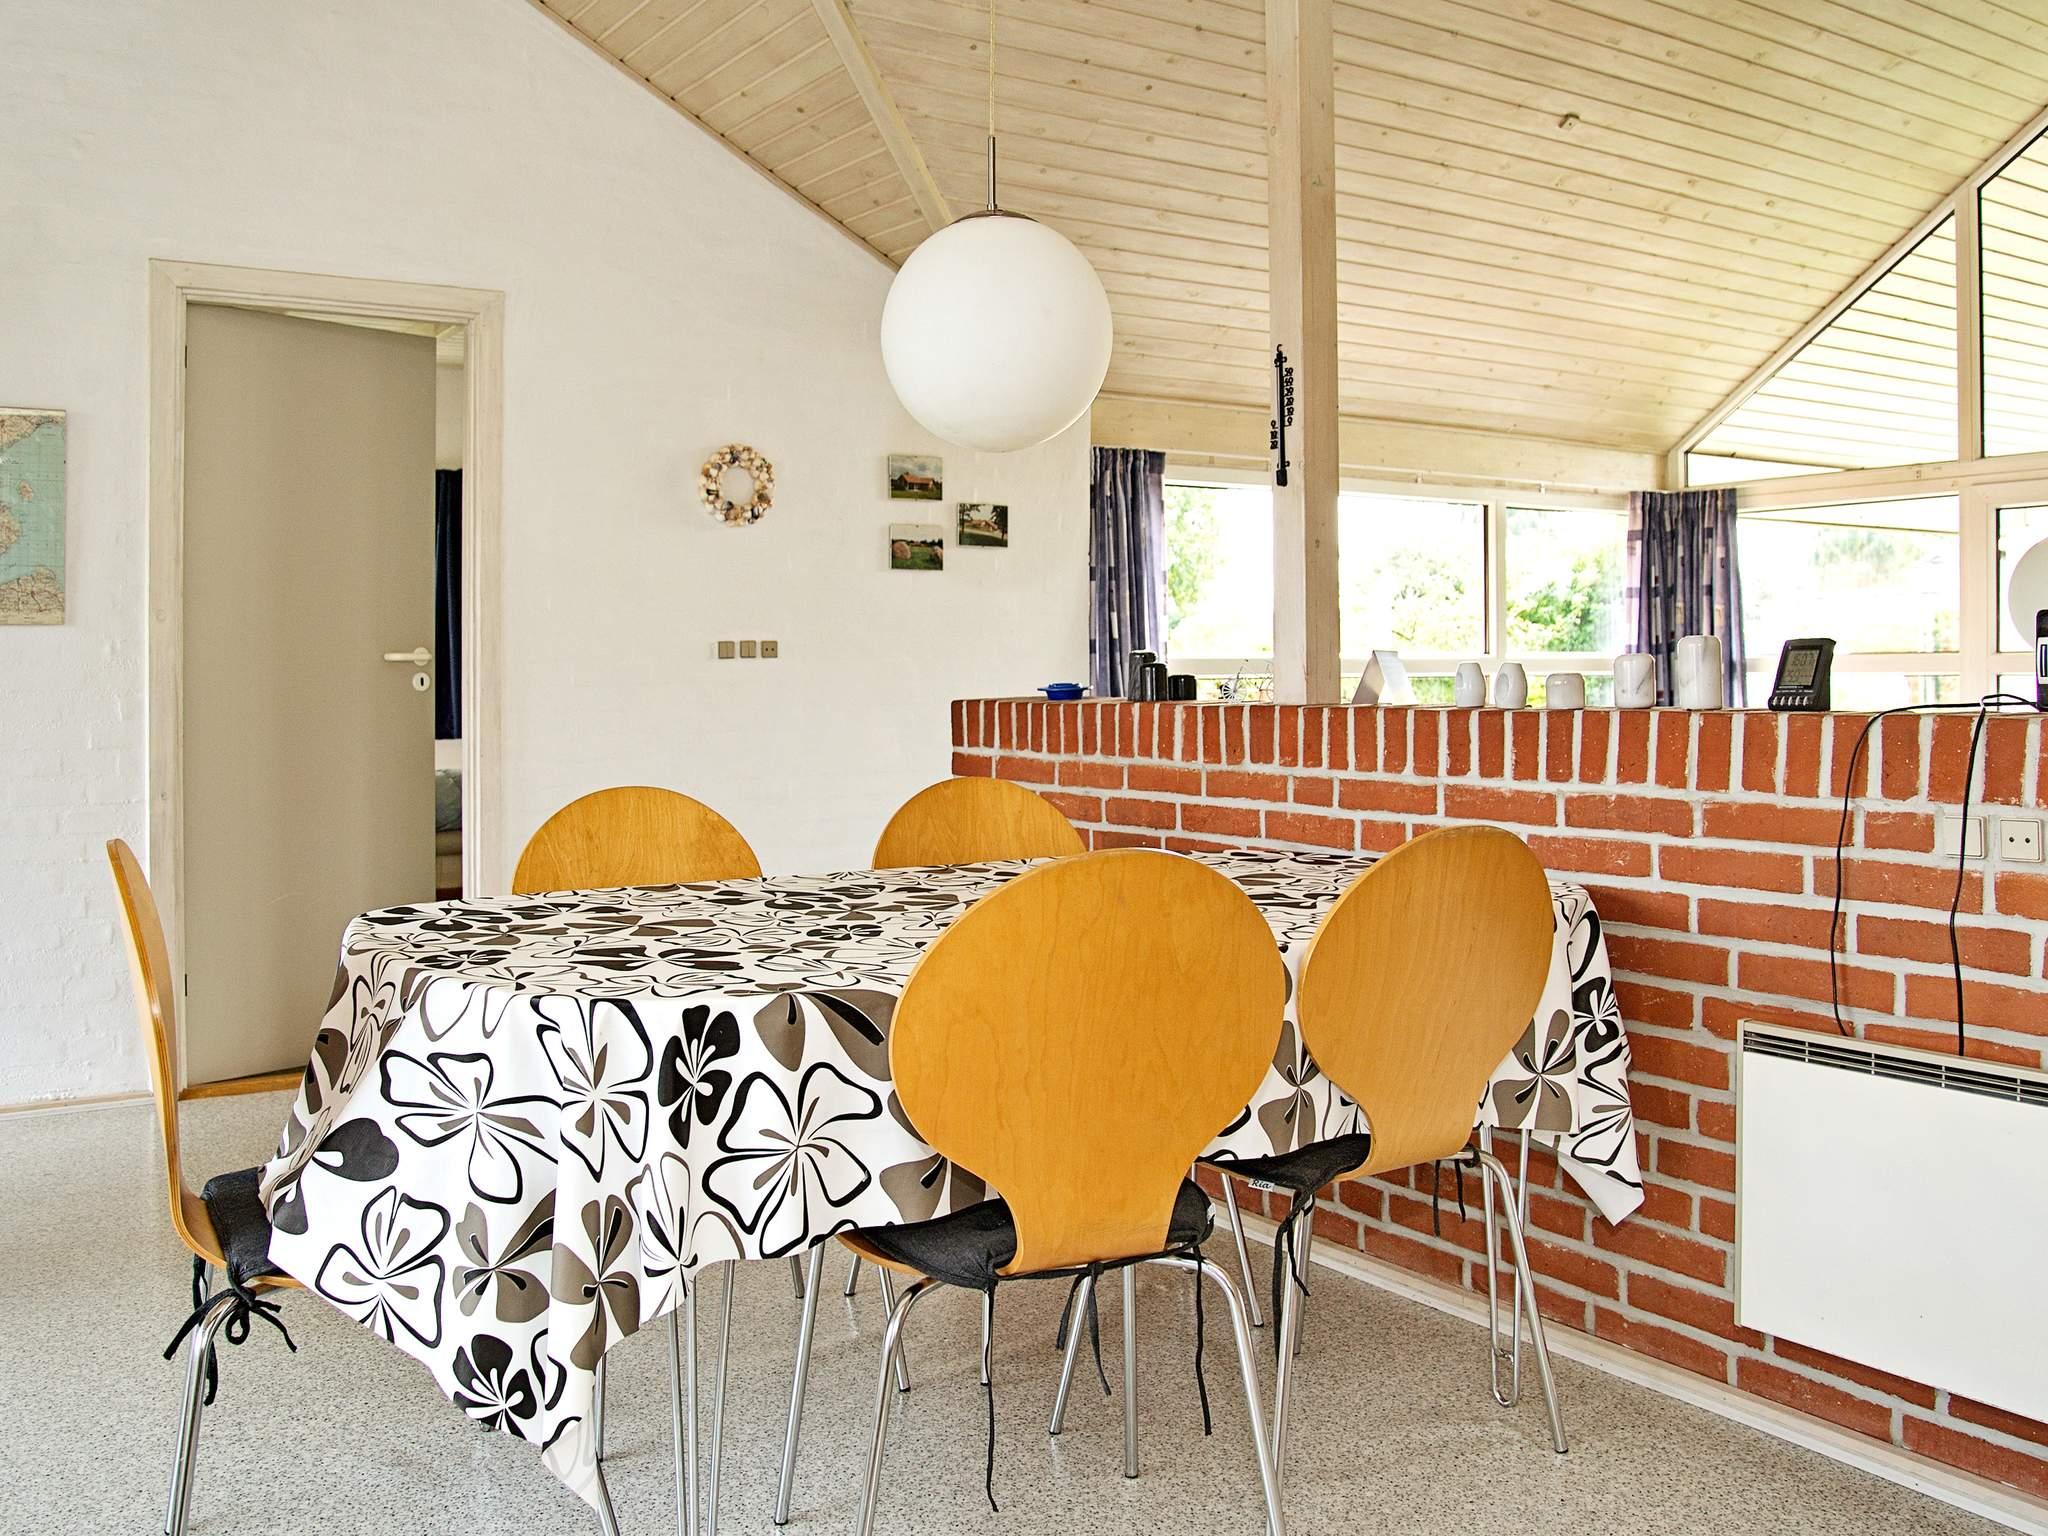 Ferienhaus Haderslev (125604), Haderslev, , Dänische Ostsee, Dänemark, Bild 6